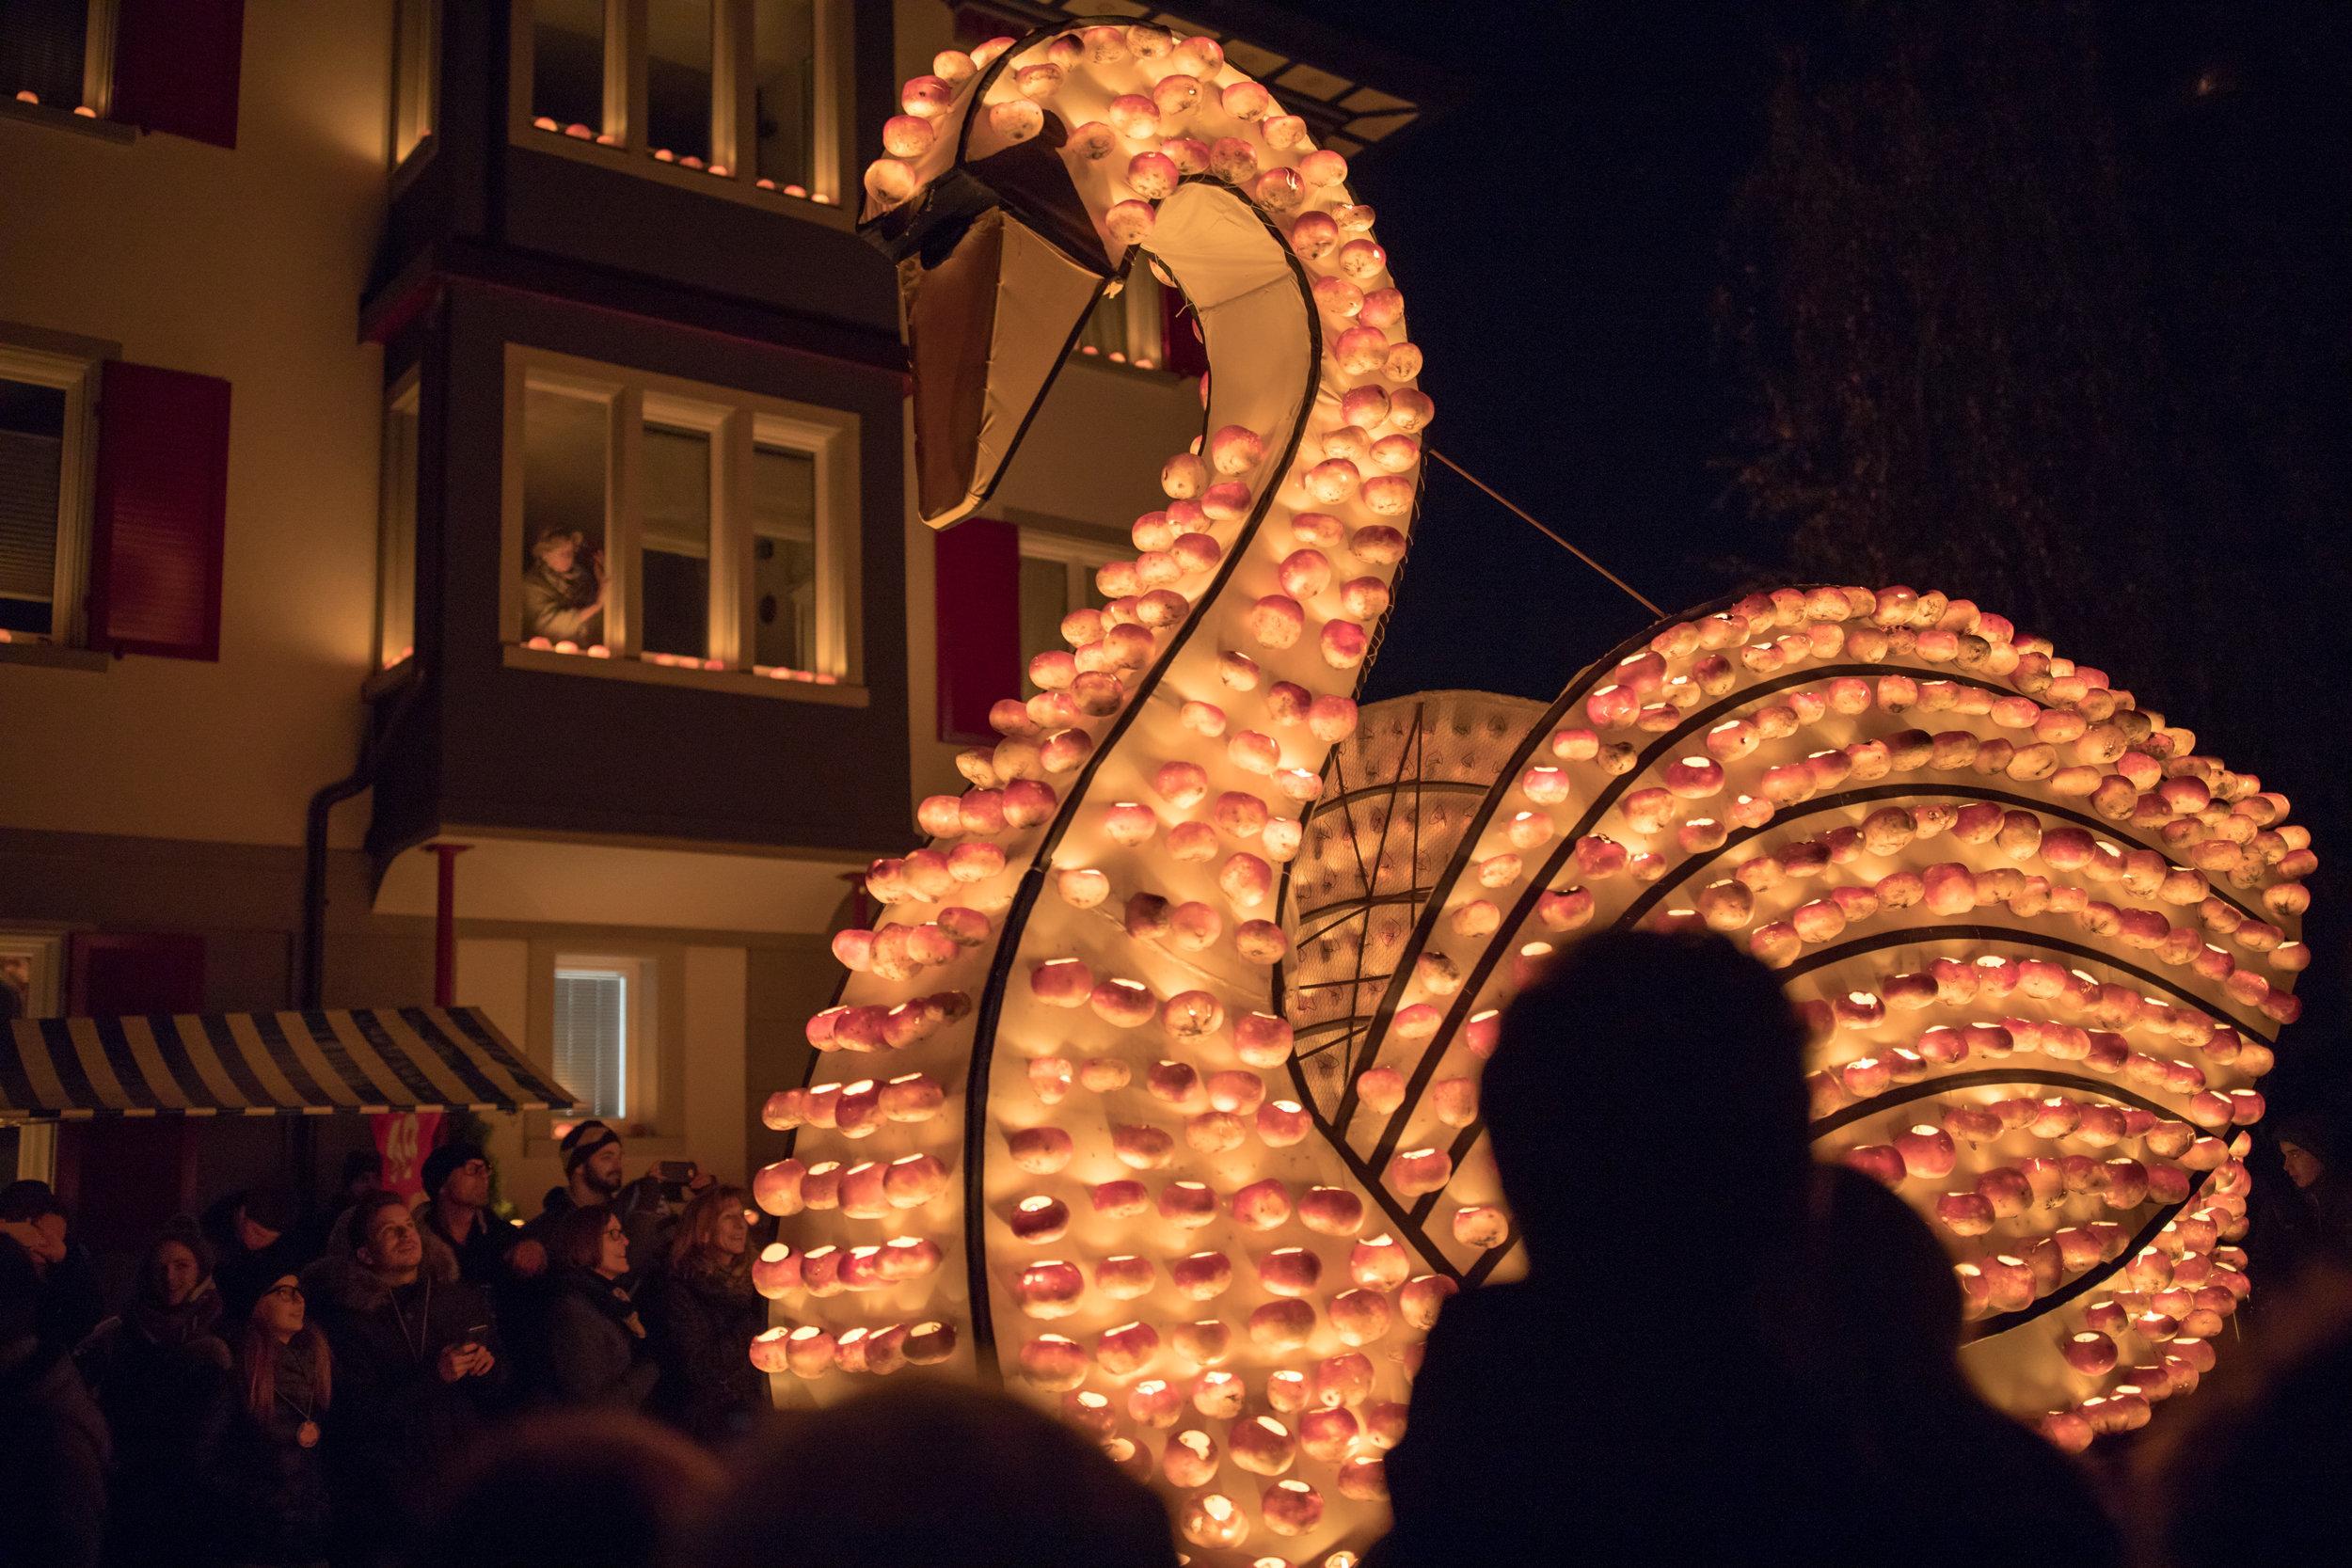 turnip-festival-parade-swan-richterswil-switzerland.jpg